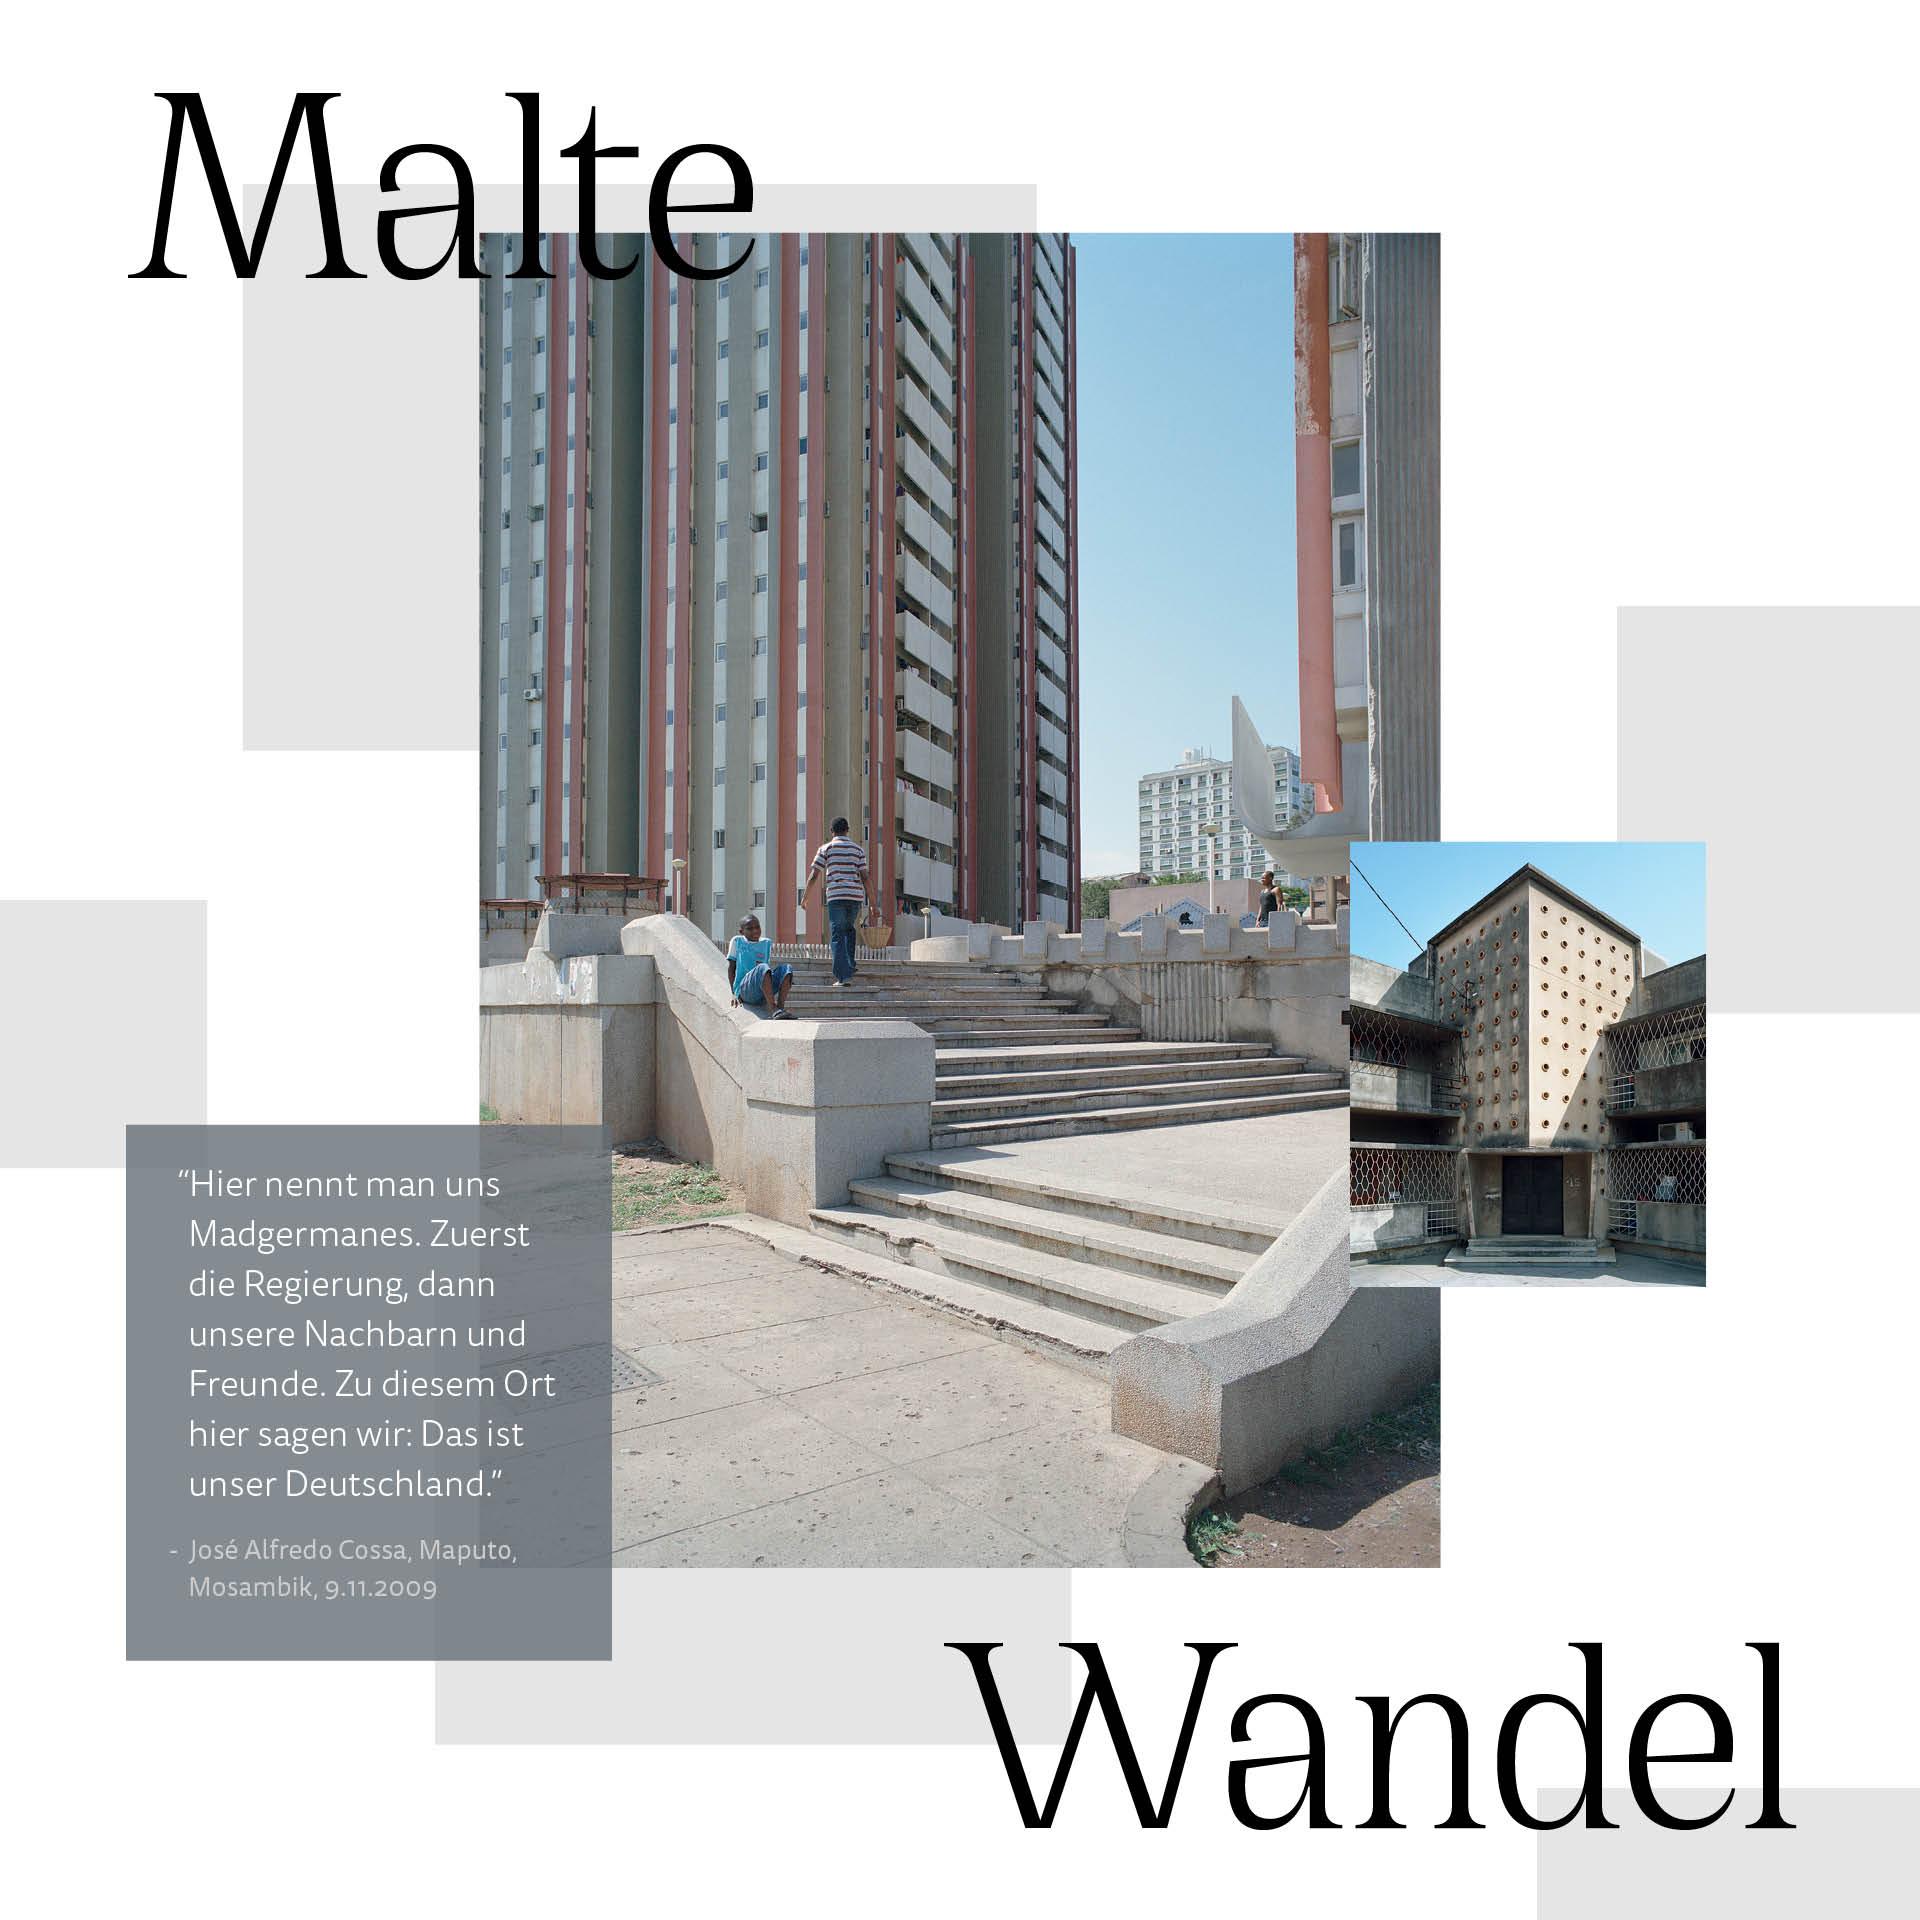 Beyond Artist Malte Wandel